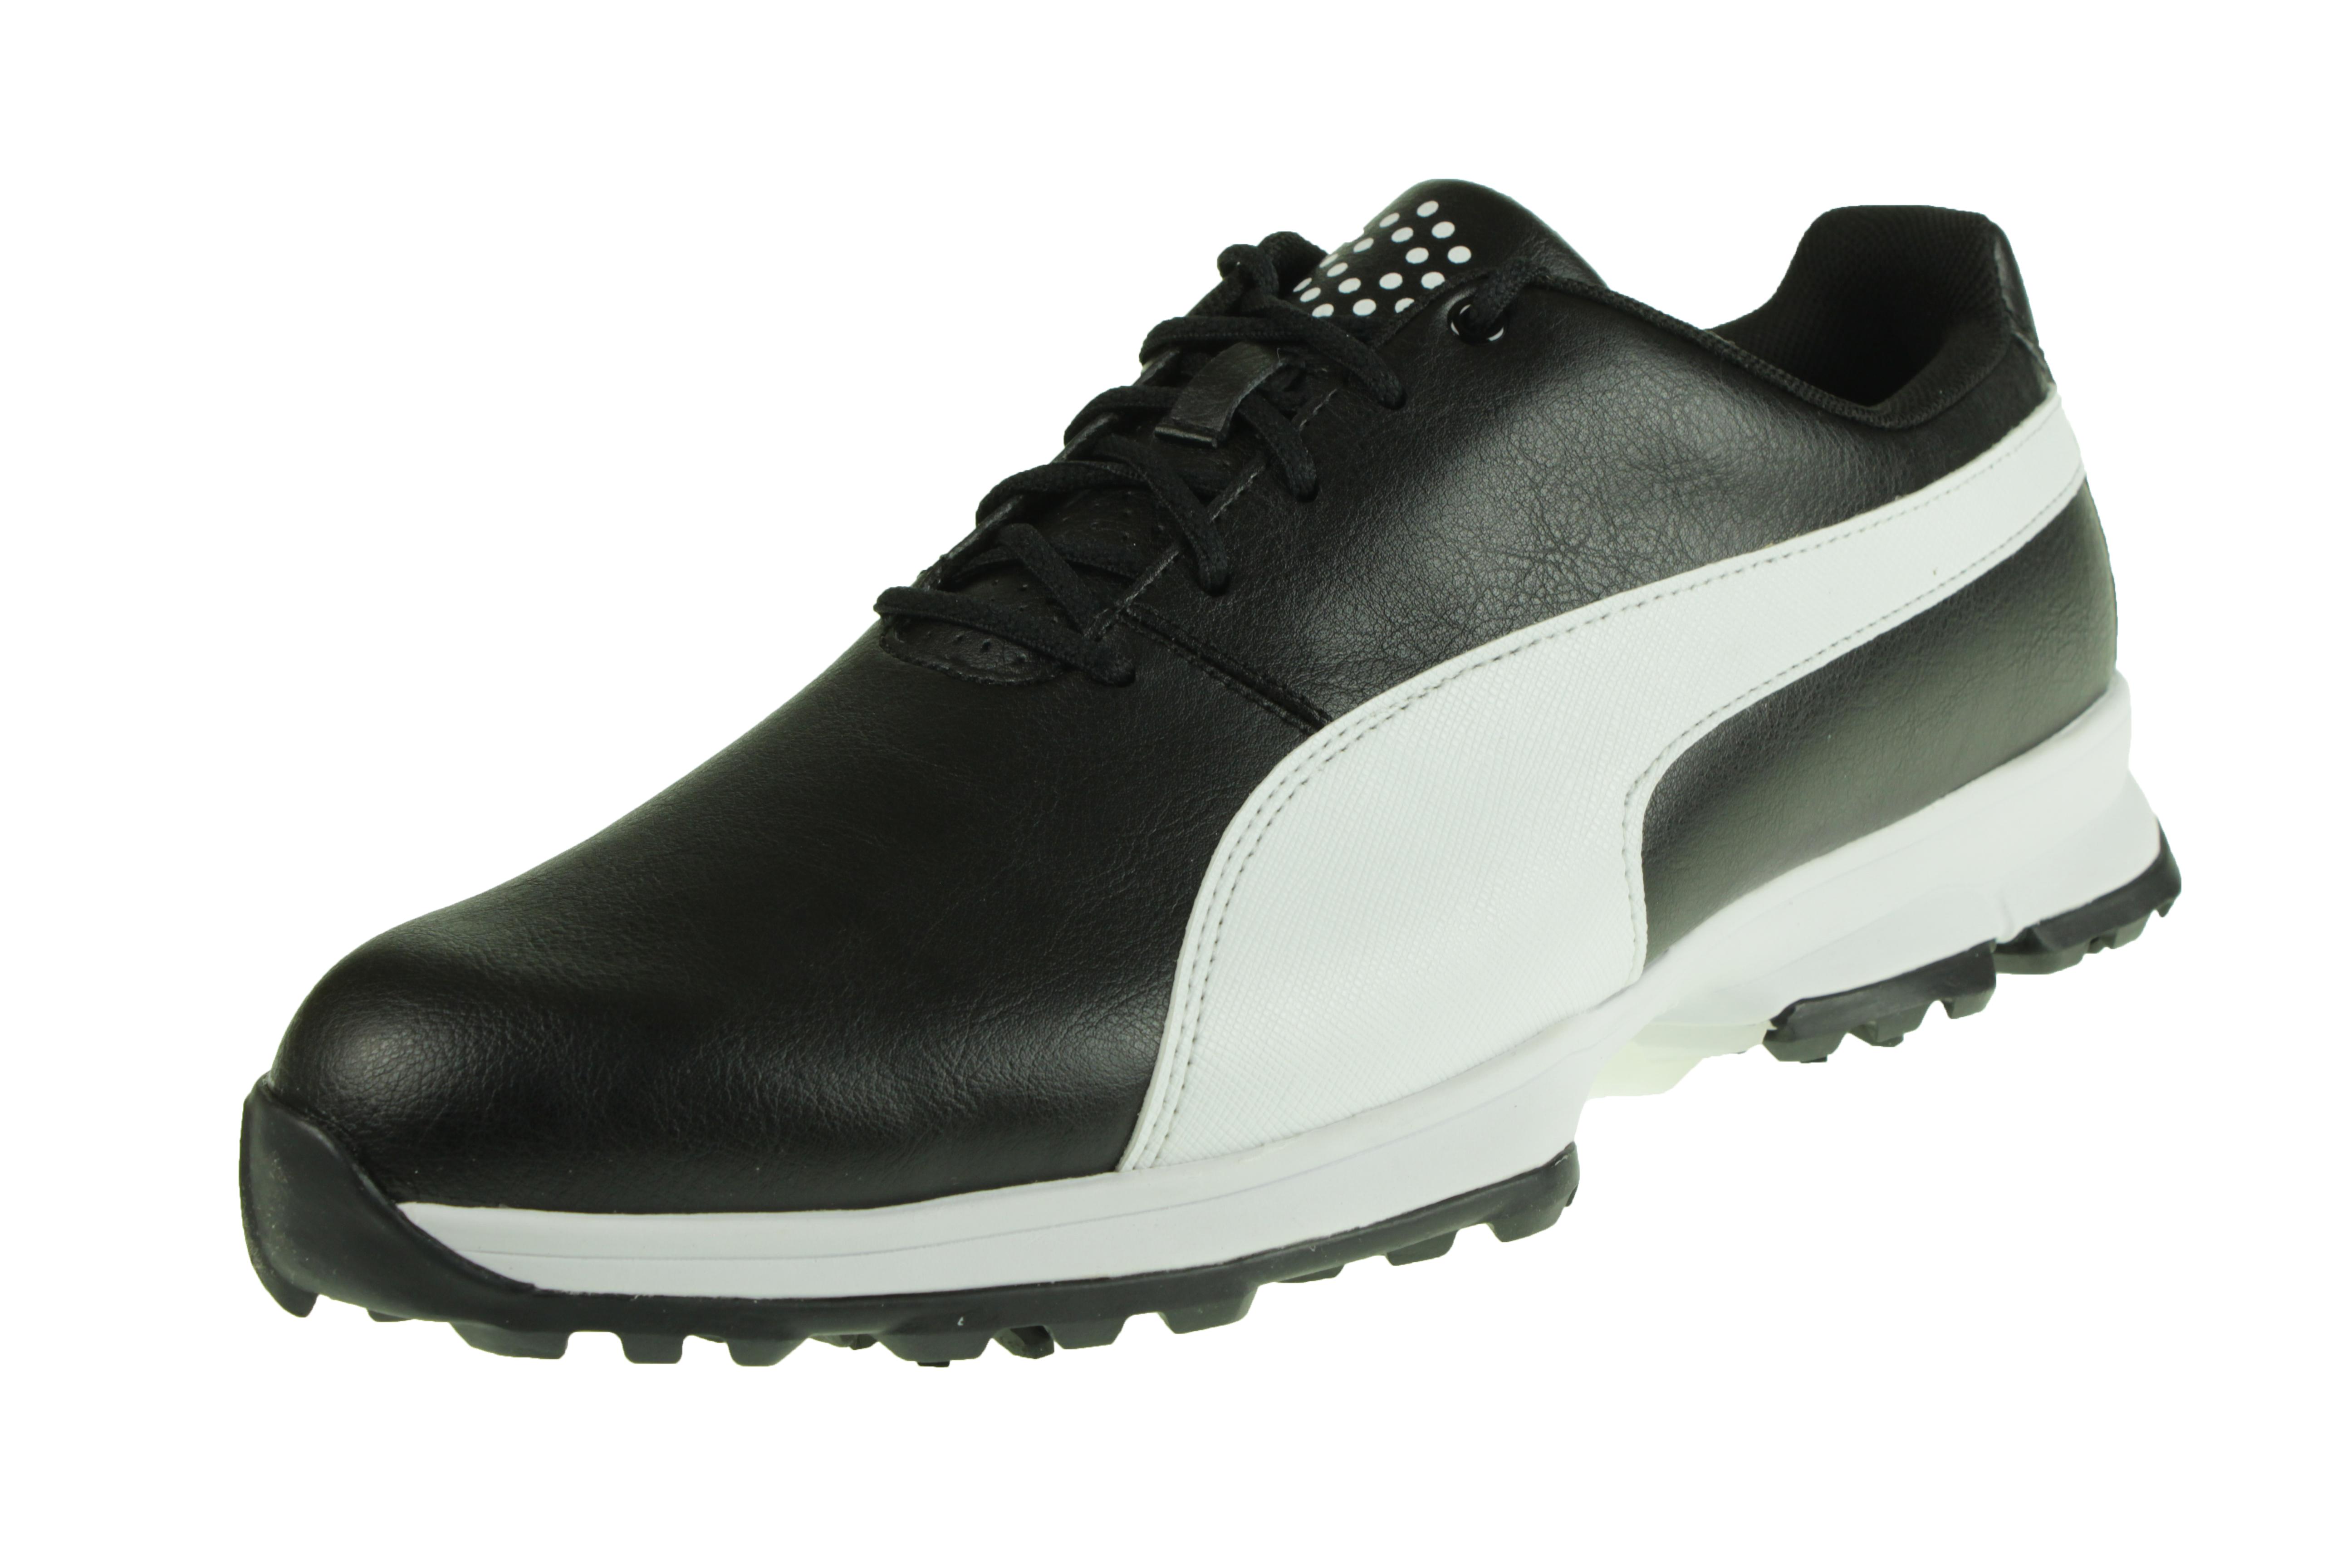 Puma Schuhe Wasserdicht